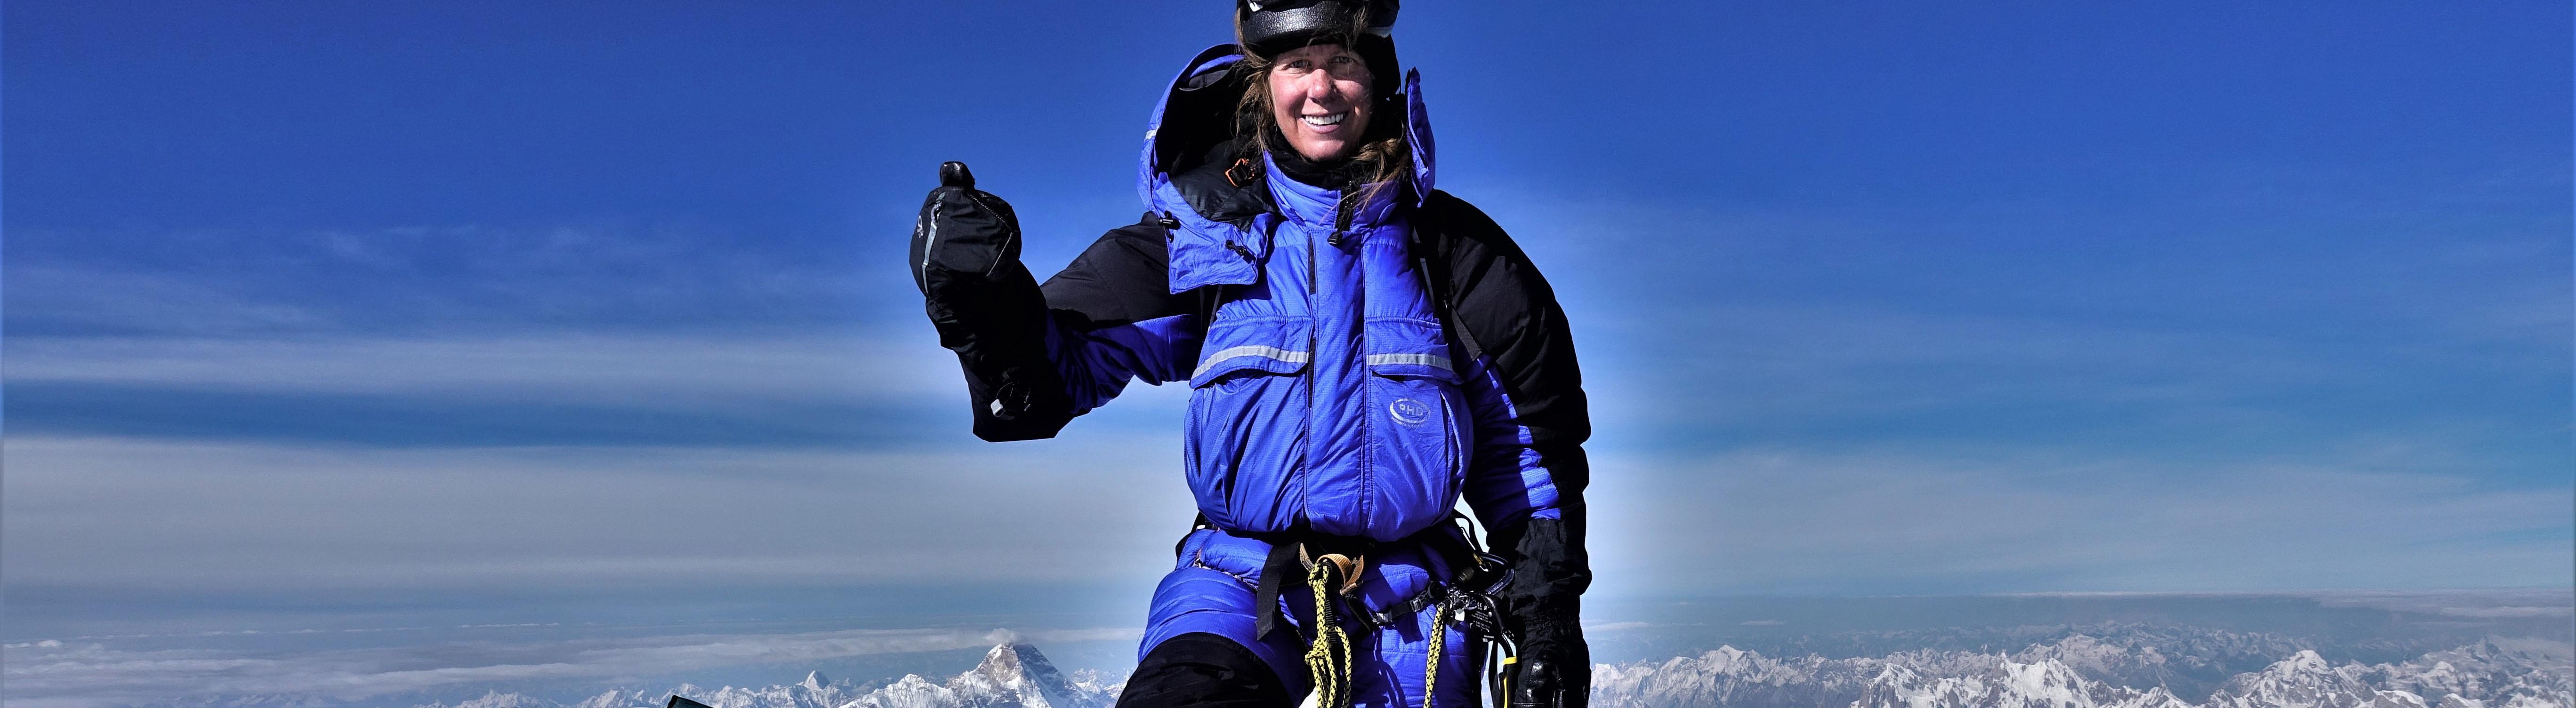 Anja Blacha auf dem Gipfel des K2